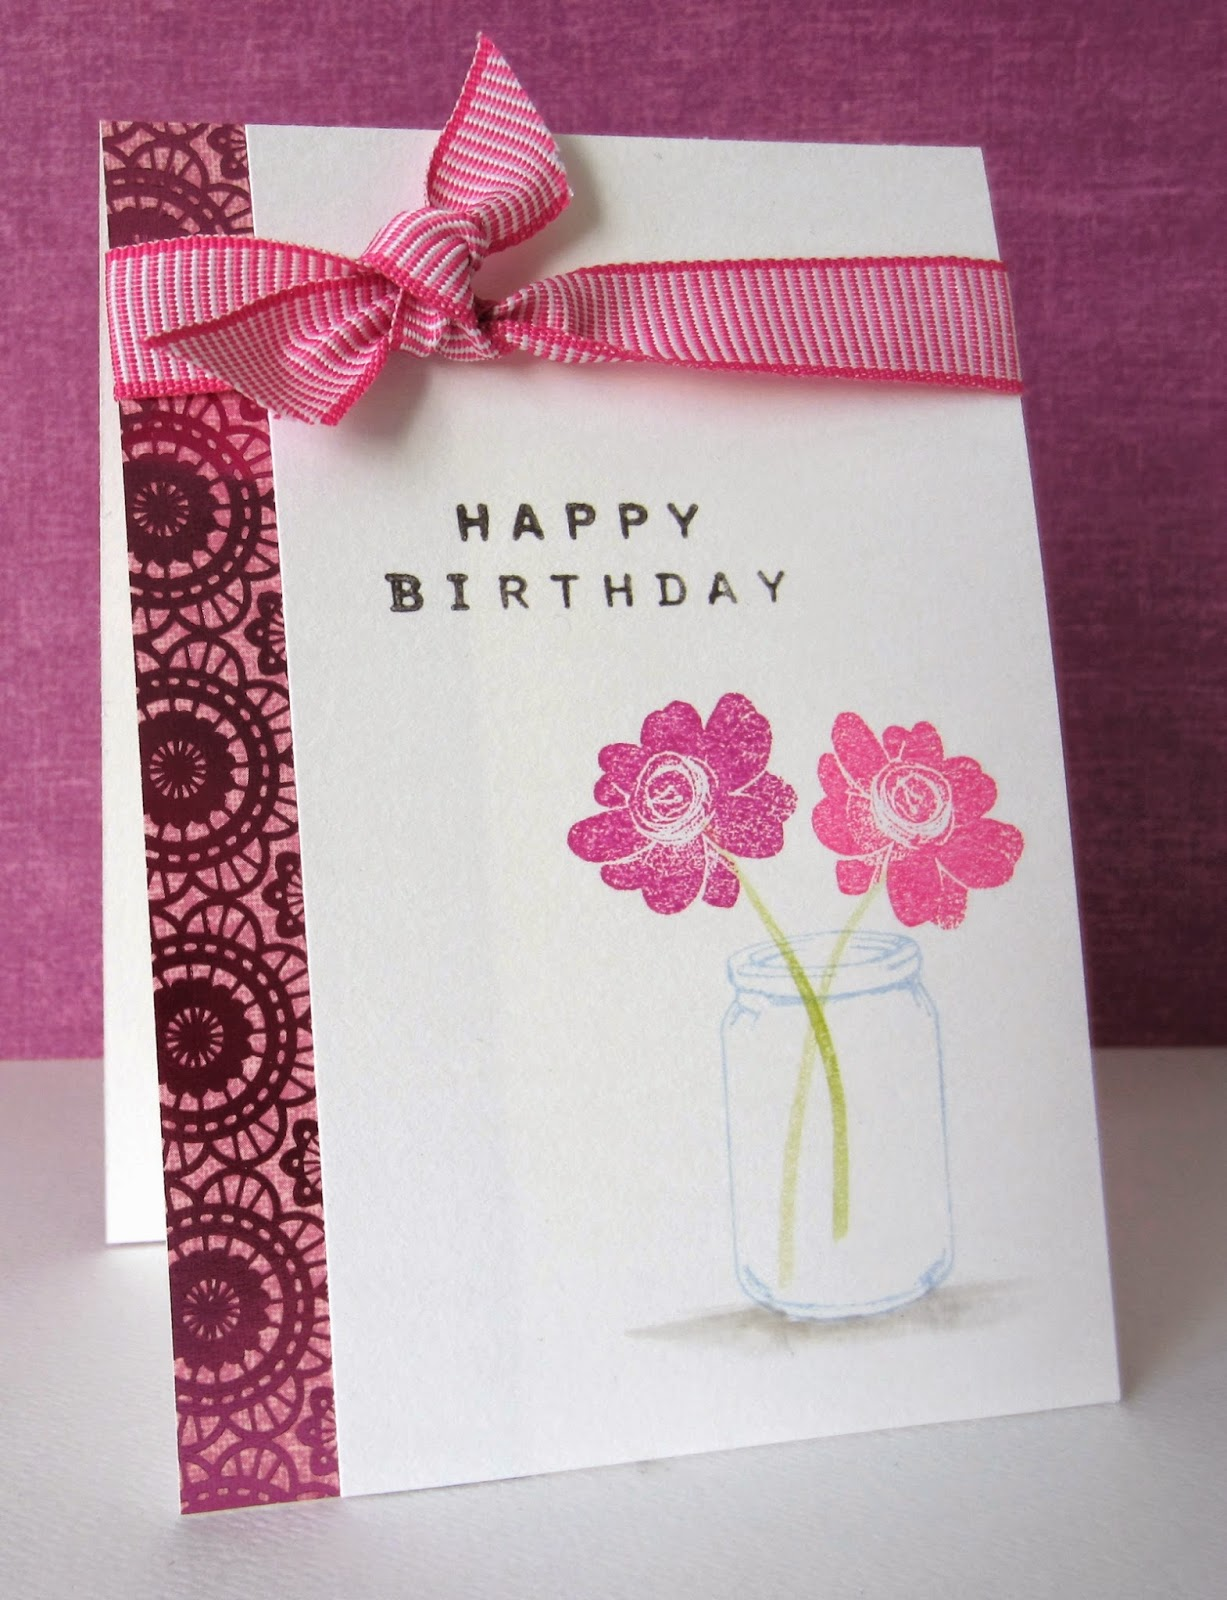 STAMPlorations™ Blog: Happy Birthday, Vicki